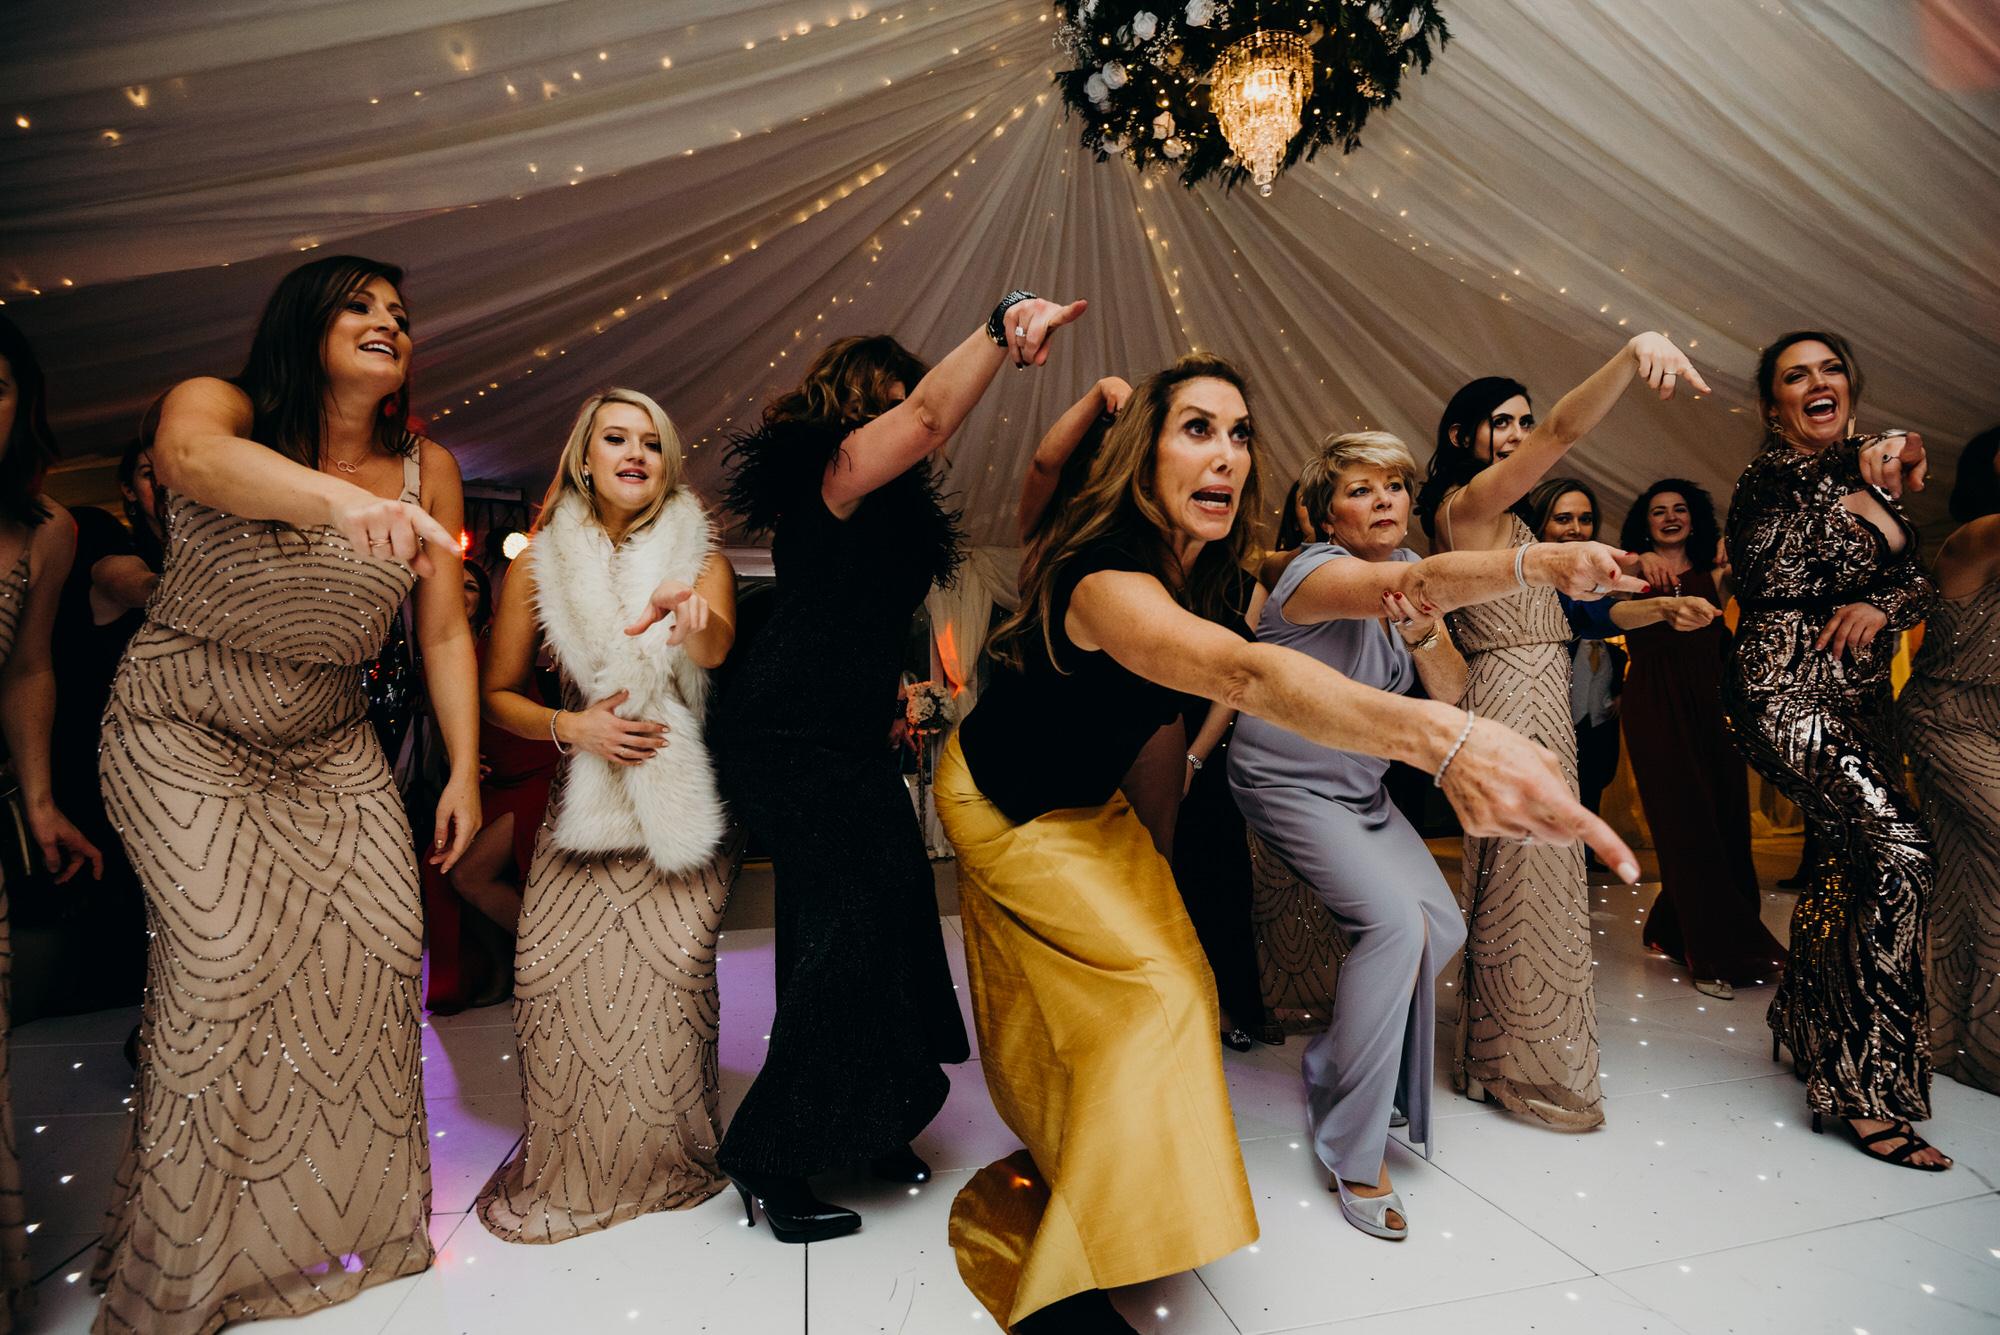 Dance off at Duntreath Castle wedding